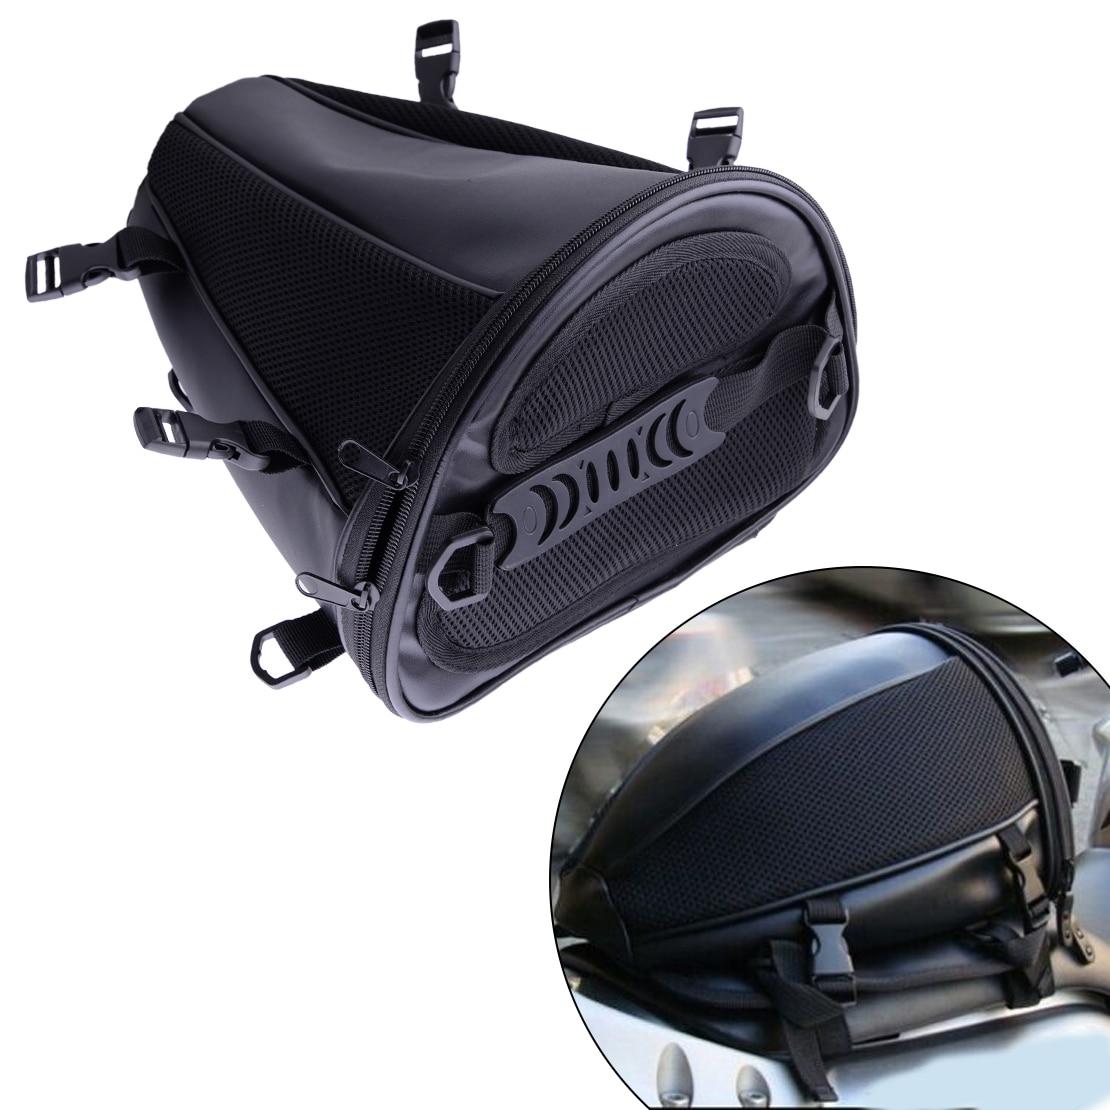 efc95669af16 US $21.49 14% OFF|CITALL Motorcycle Dirt Bike Dual Sport Black Waterproof  Microfiber Tail Bag Back Seat Storage Carry Hand Shoulder Saddlebags-in ...